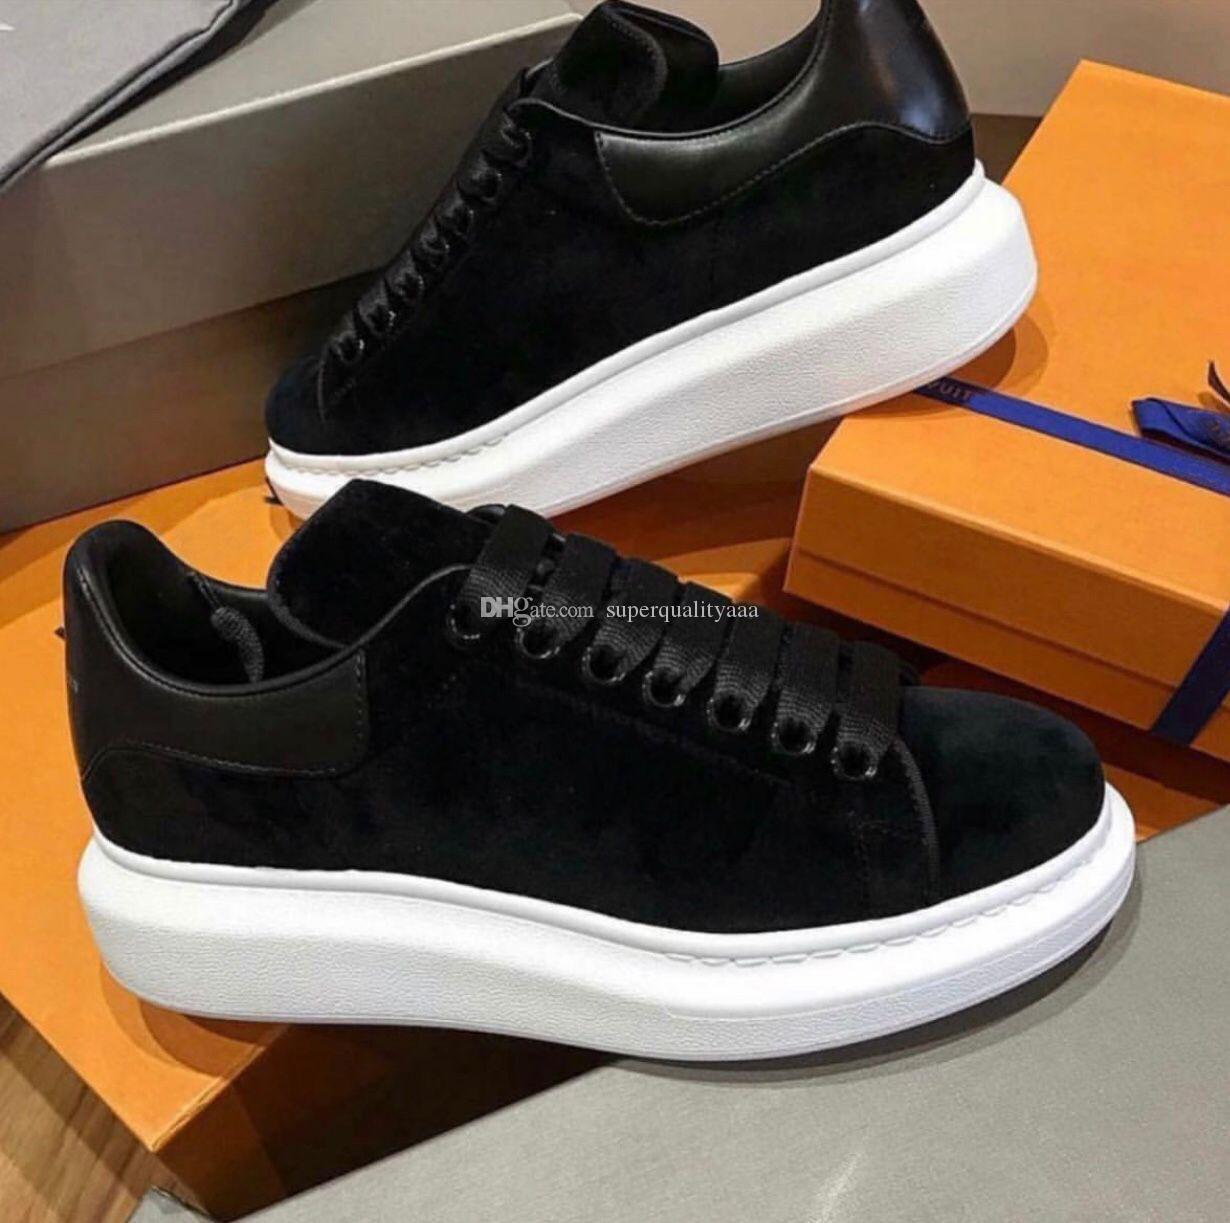 Black Velvet-Leder-Plattform-Trainer-hochwertige Designer-weißes Leder-Sneakers Frauen, Männer Outdoor Casual Sport EU35-46, Box, Staubbeutel